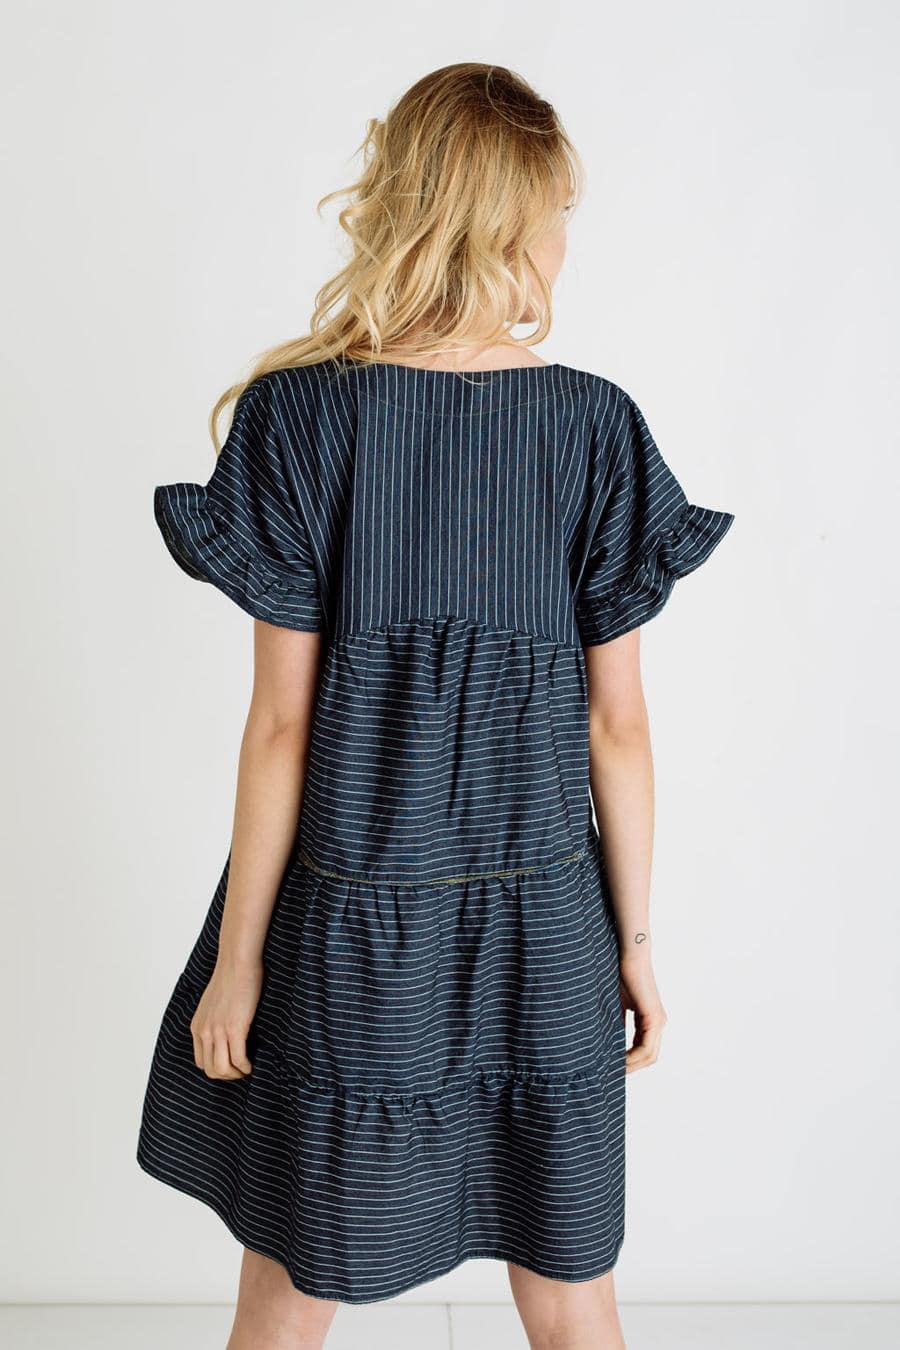 jagger zenska haljina kolekcija prolece leto 2021 ss 2021 kupi online jg 5501 03 3